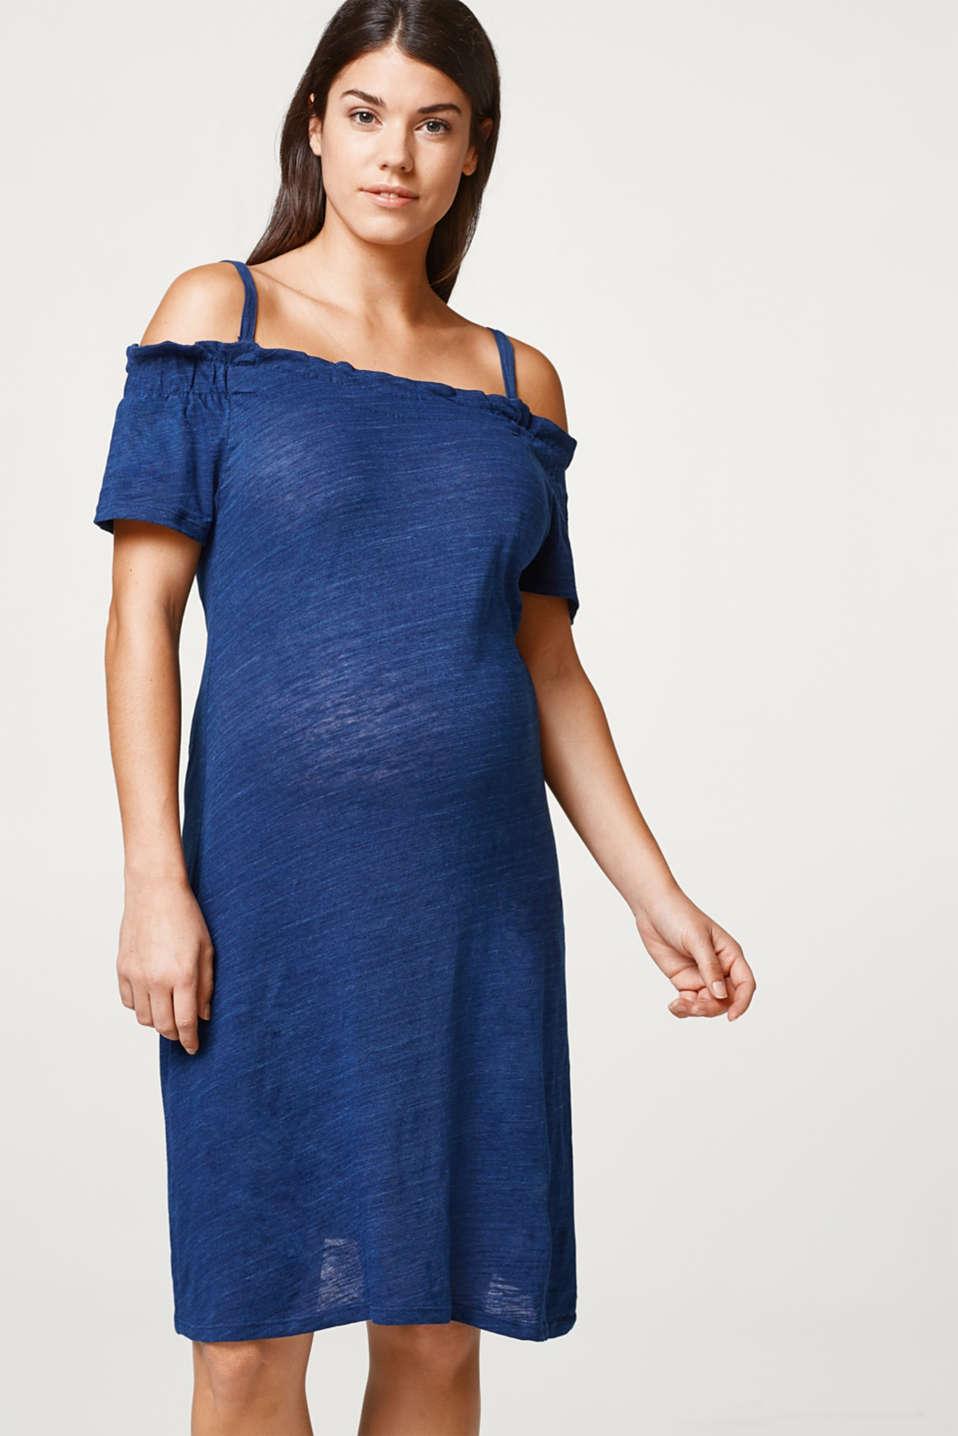 Slub jersey nursing dress, LCAZURE BLUE, detail image number 0